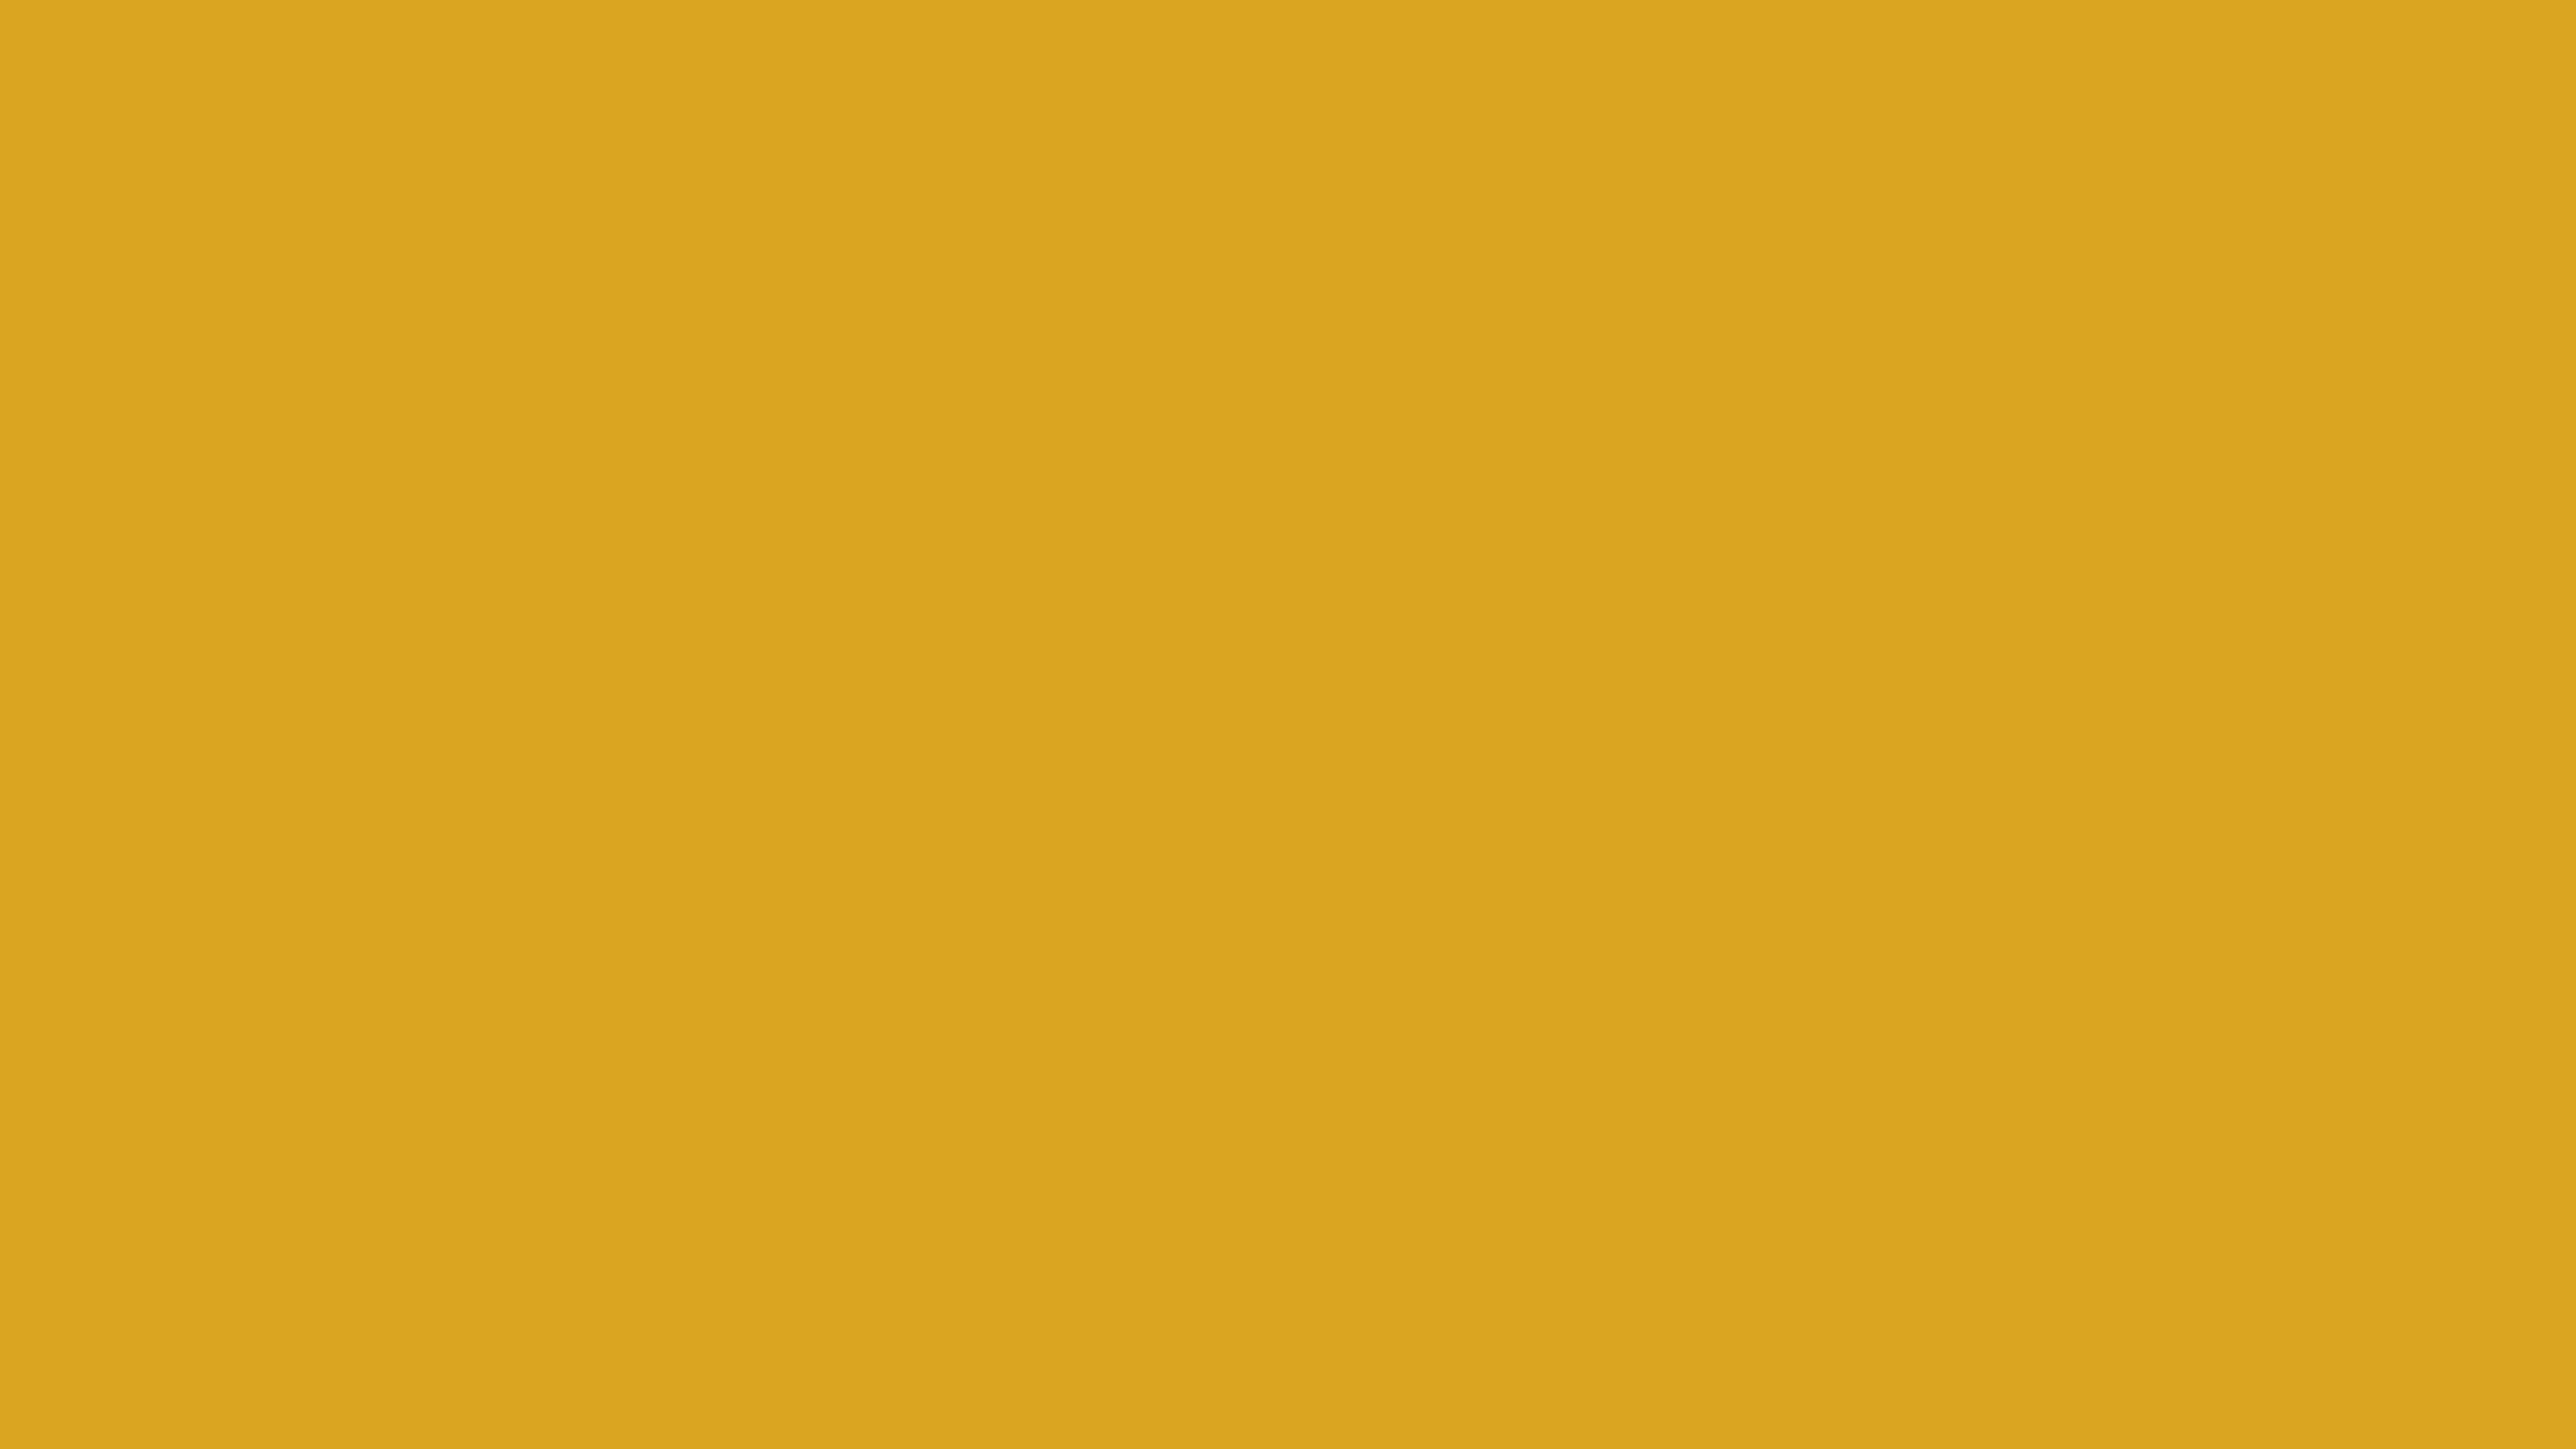 5120x2880 Goldenrod Solid Color Background